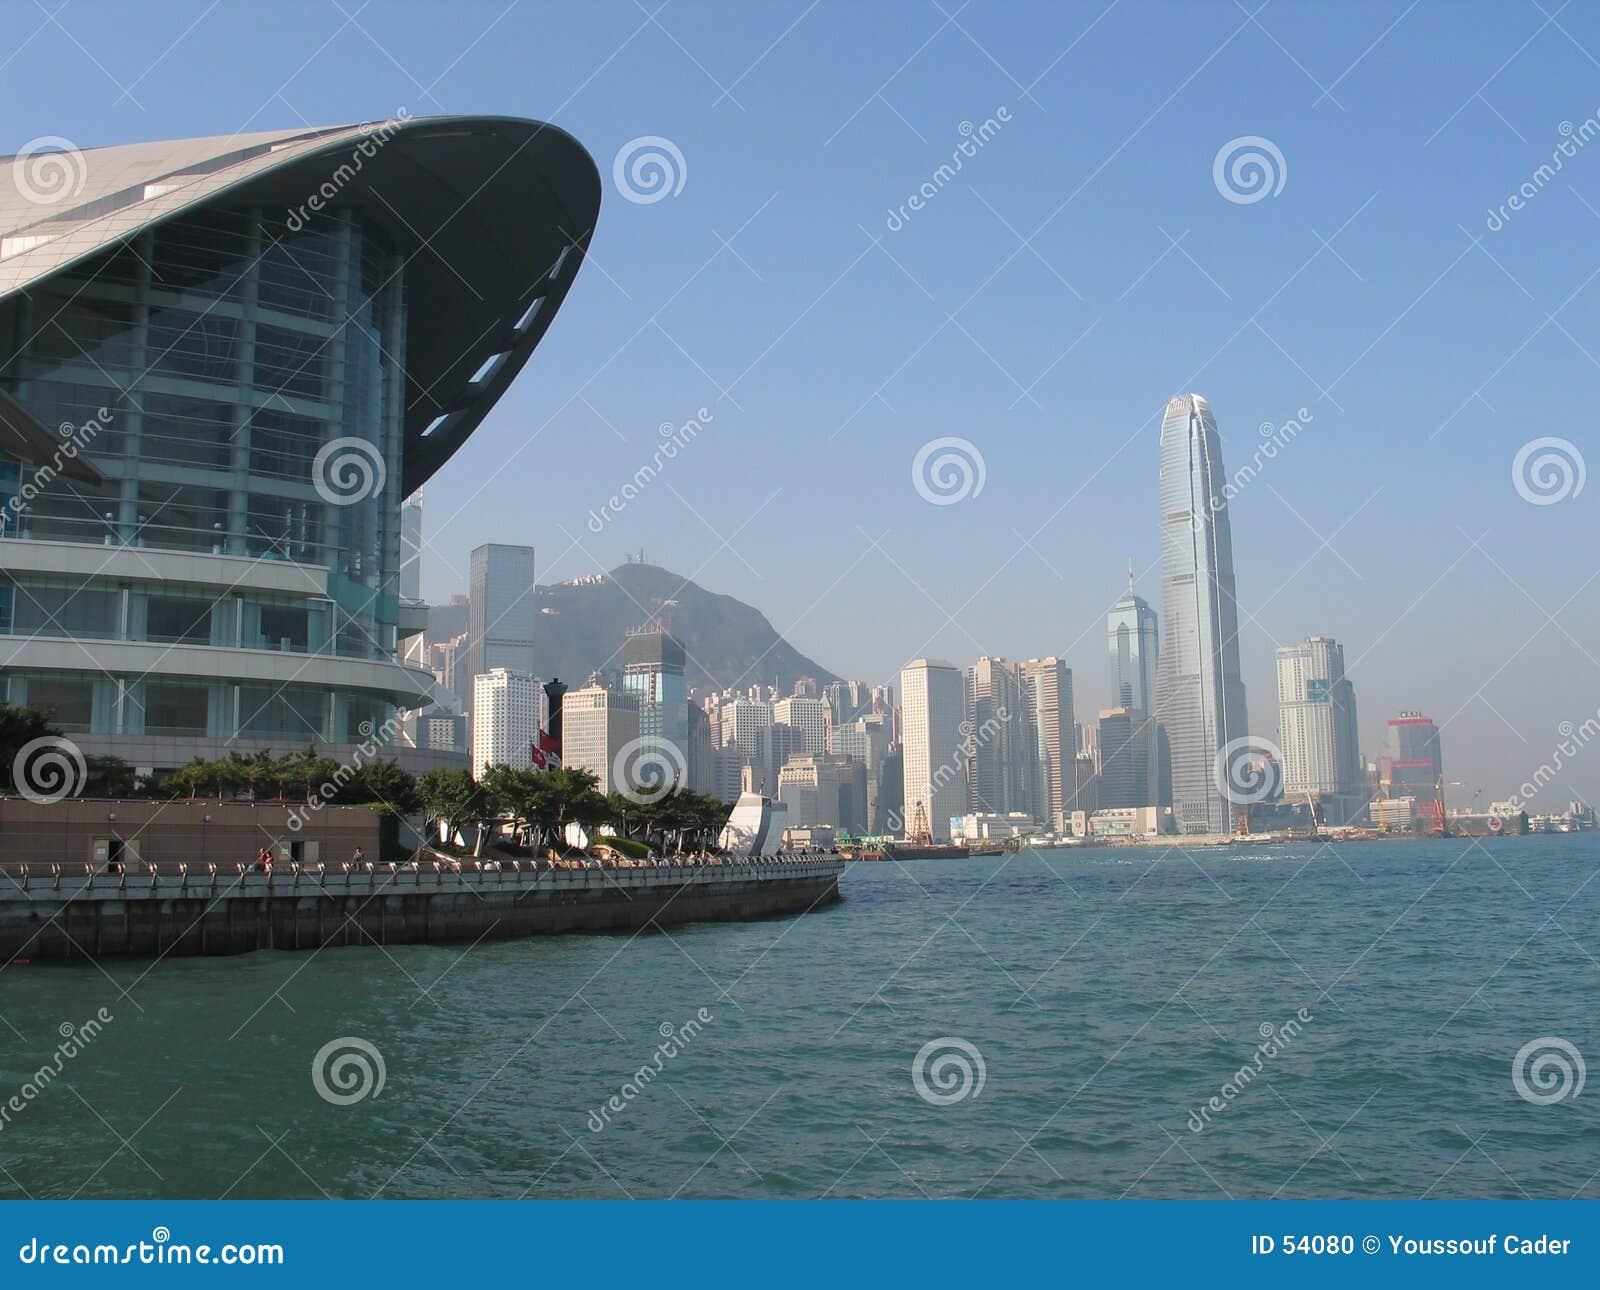 Modern building 5